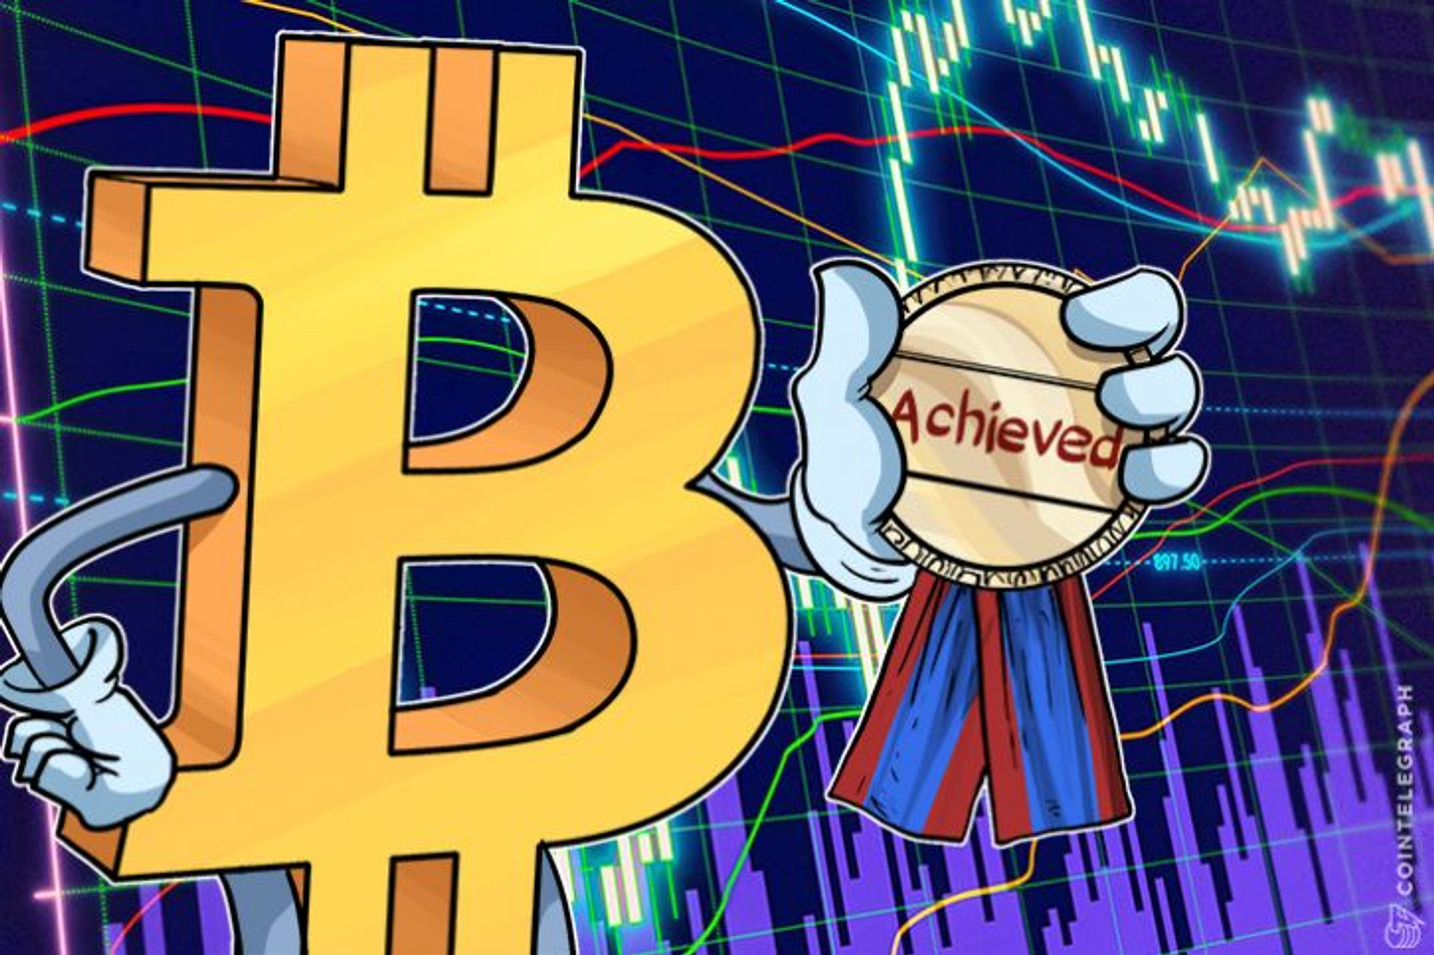 Erik Voorhees氏曰く―ビットコインは大型株並みの価格安定性を実現した